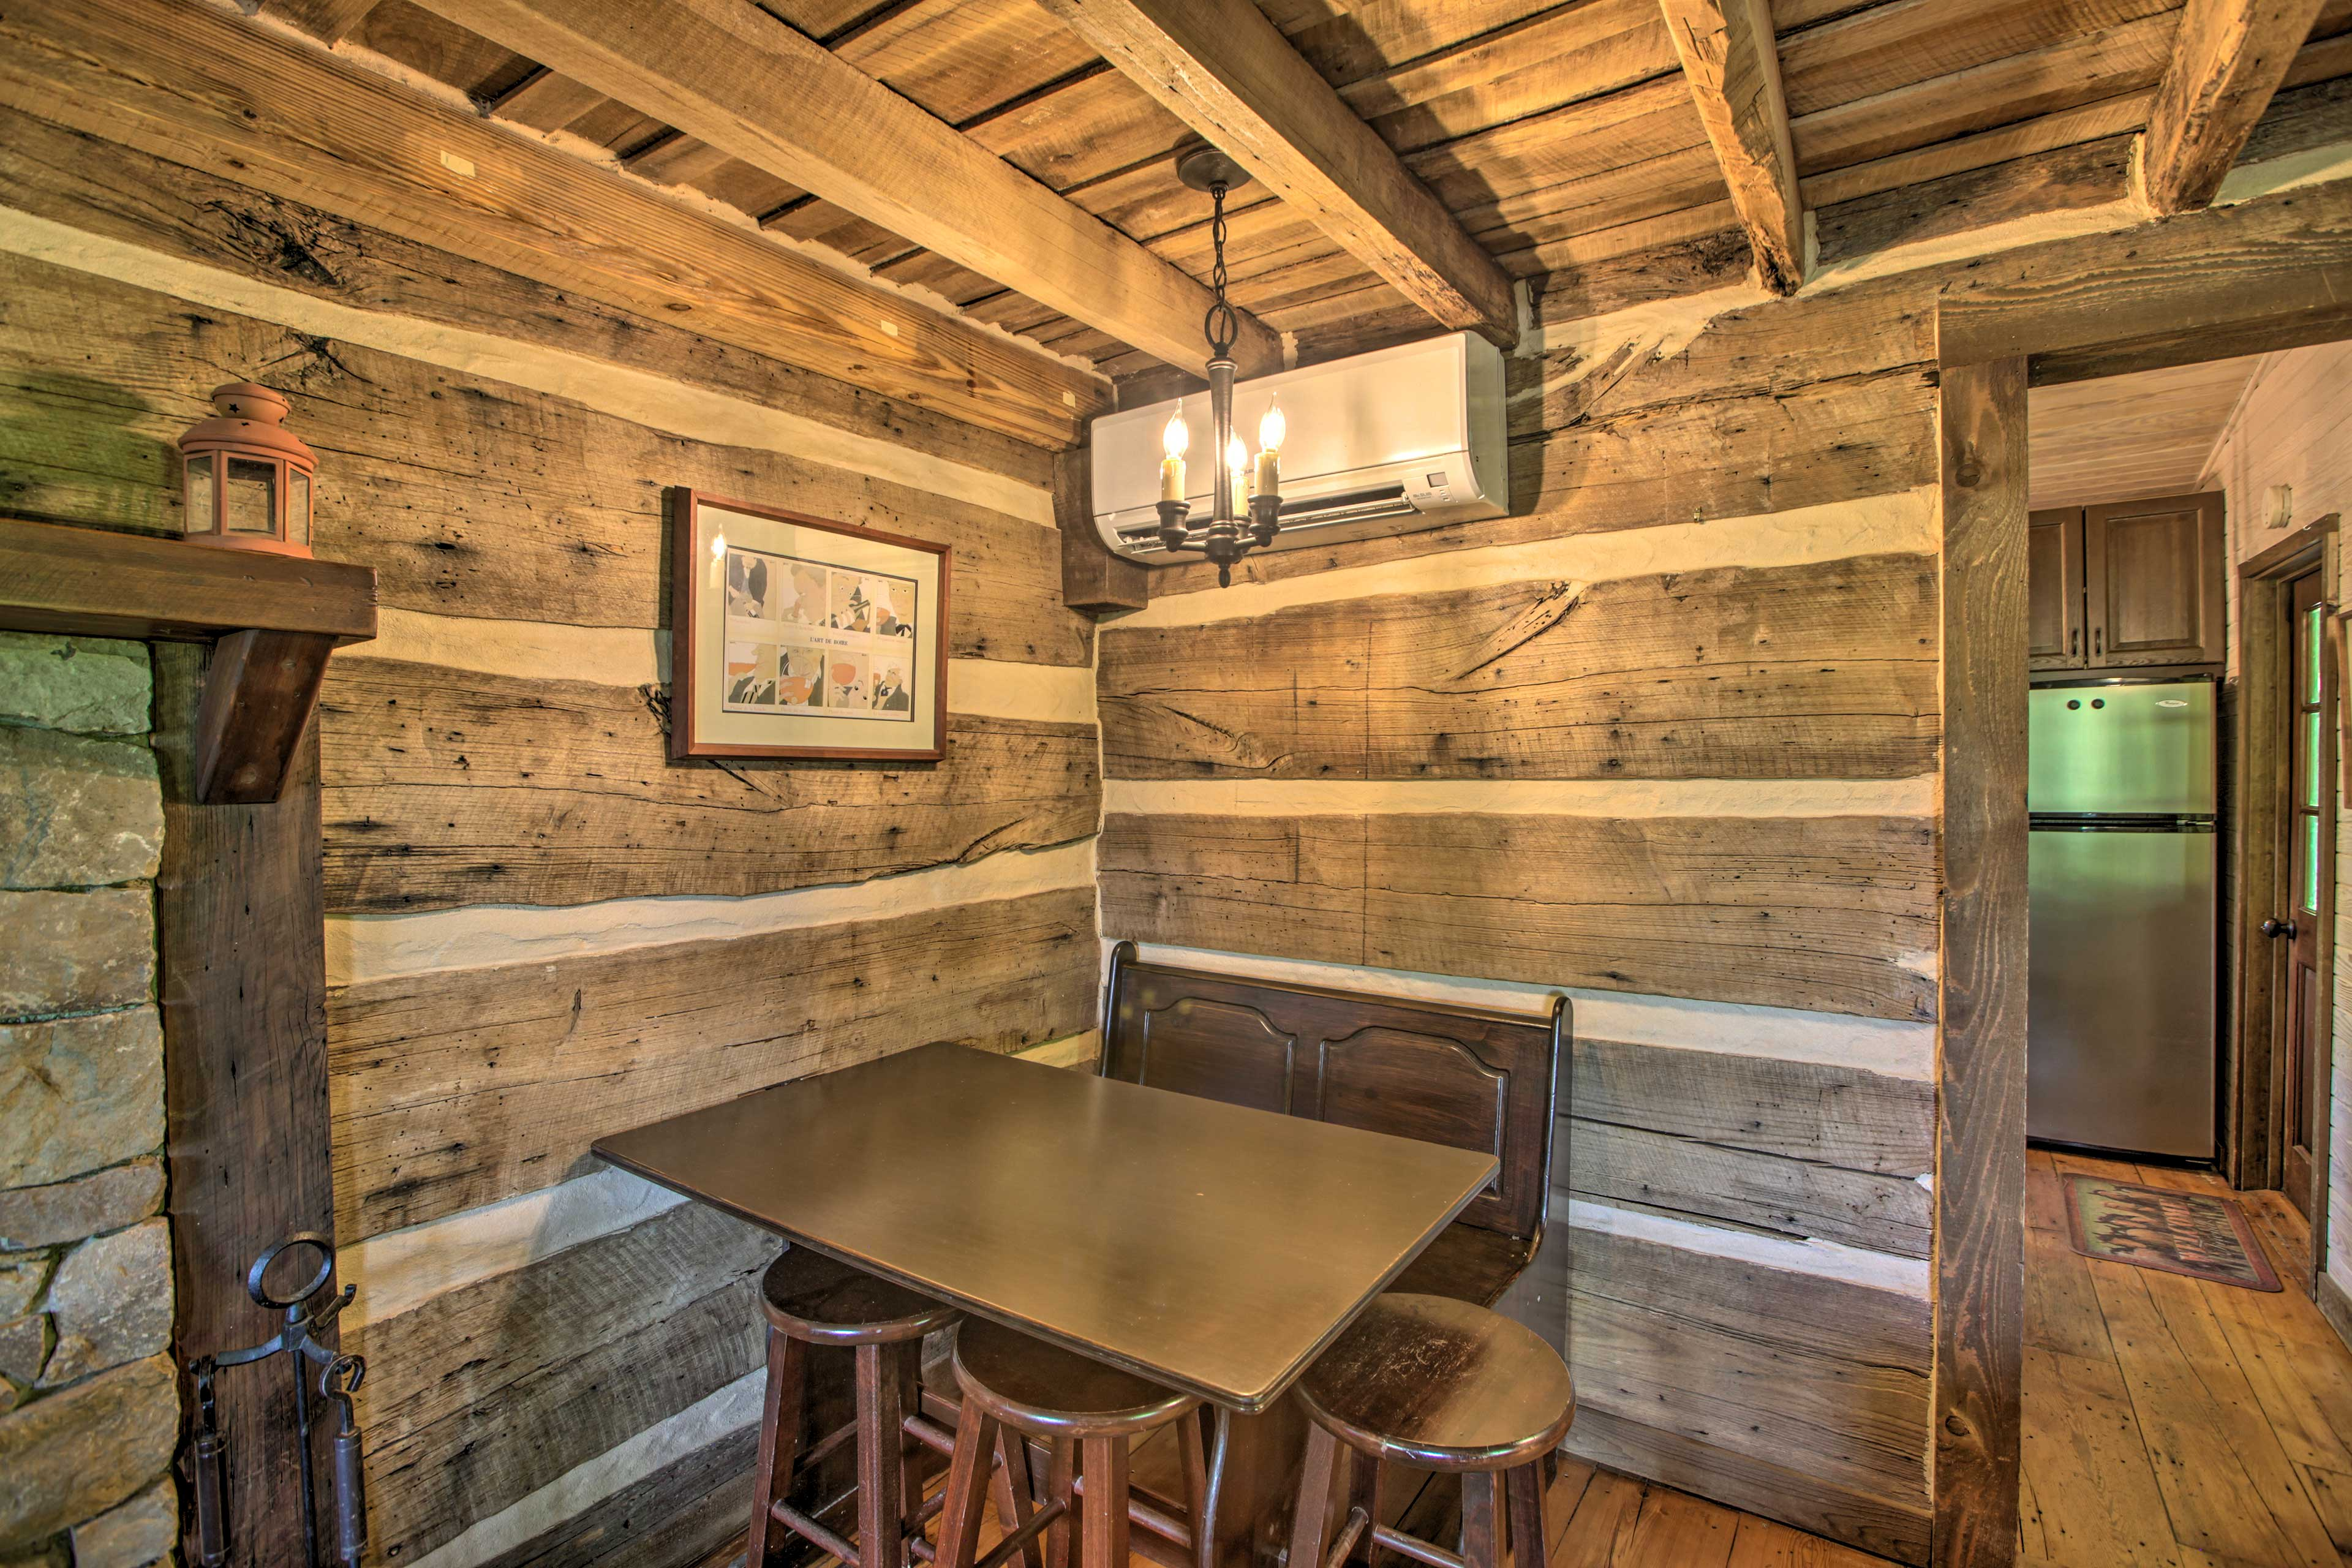 Dining Area | Dishware & Flatware Provided